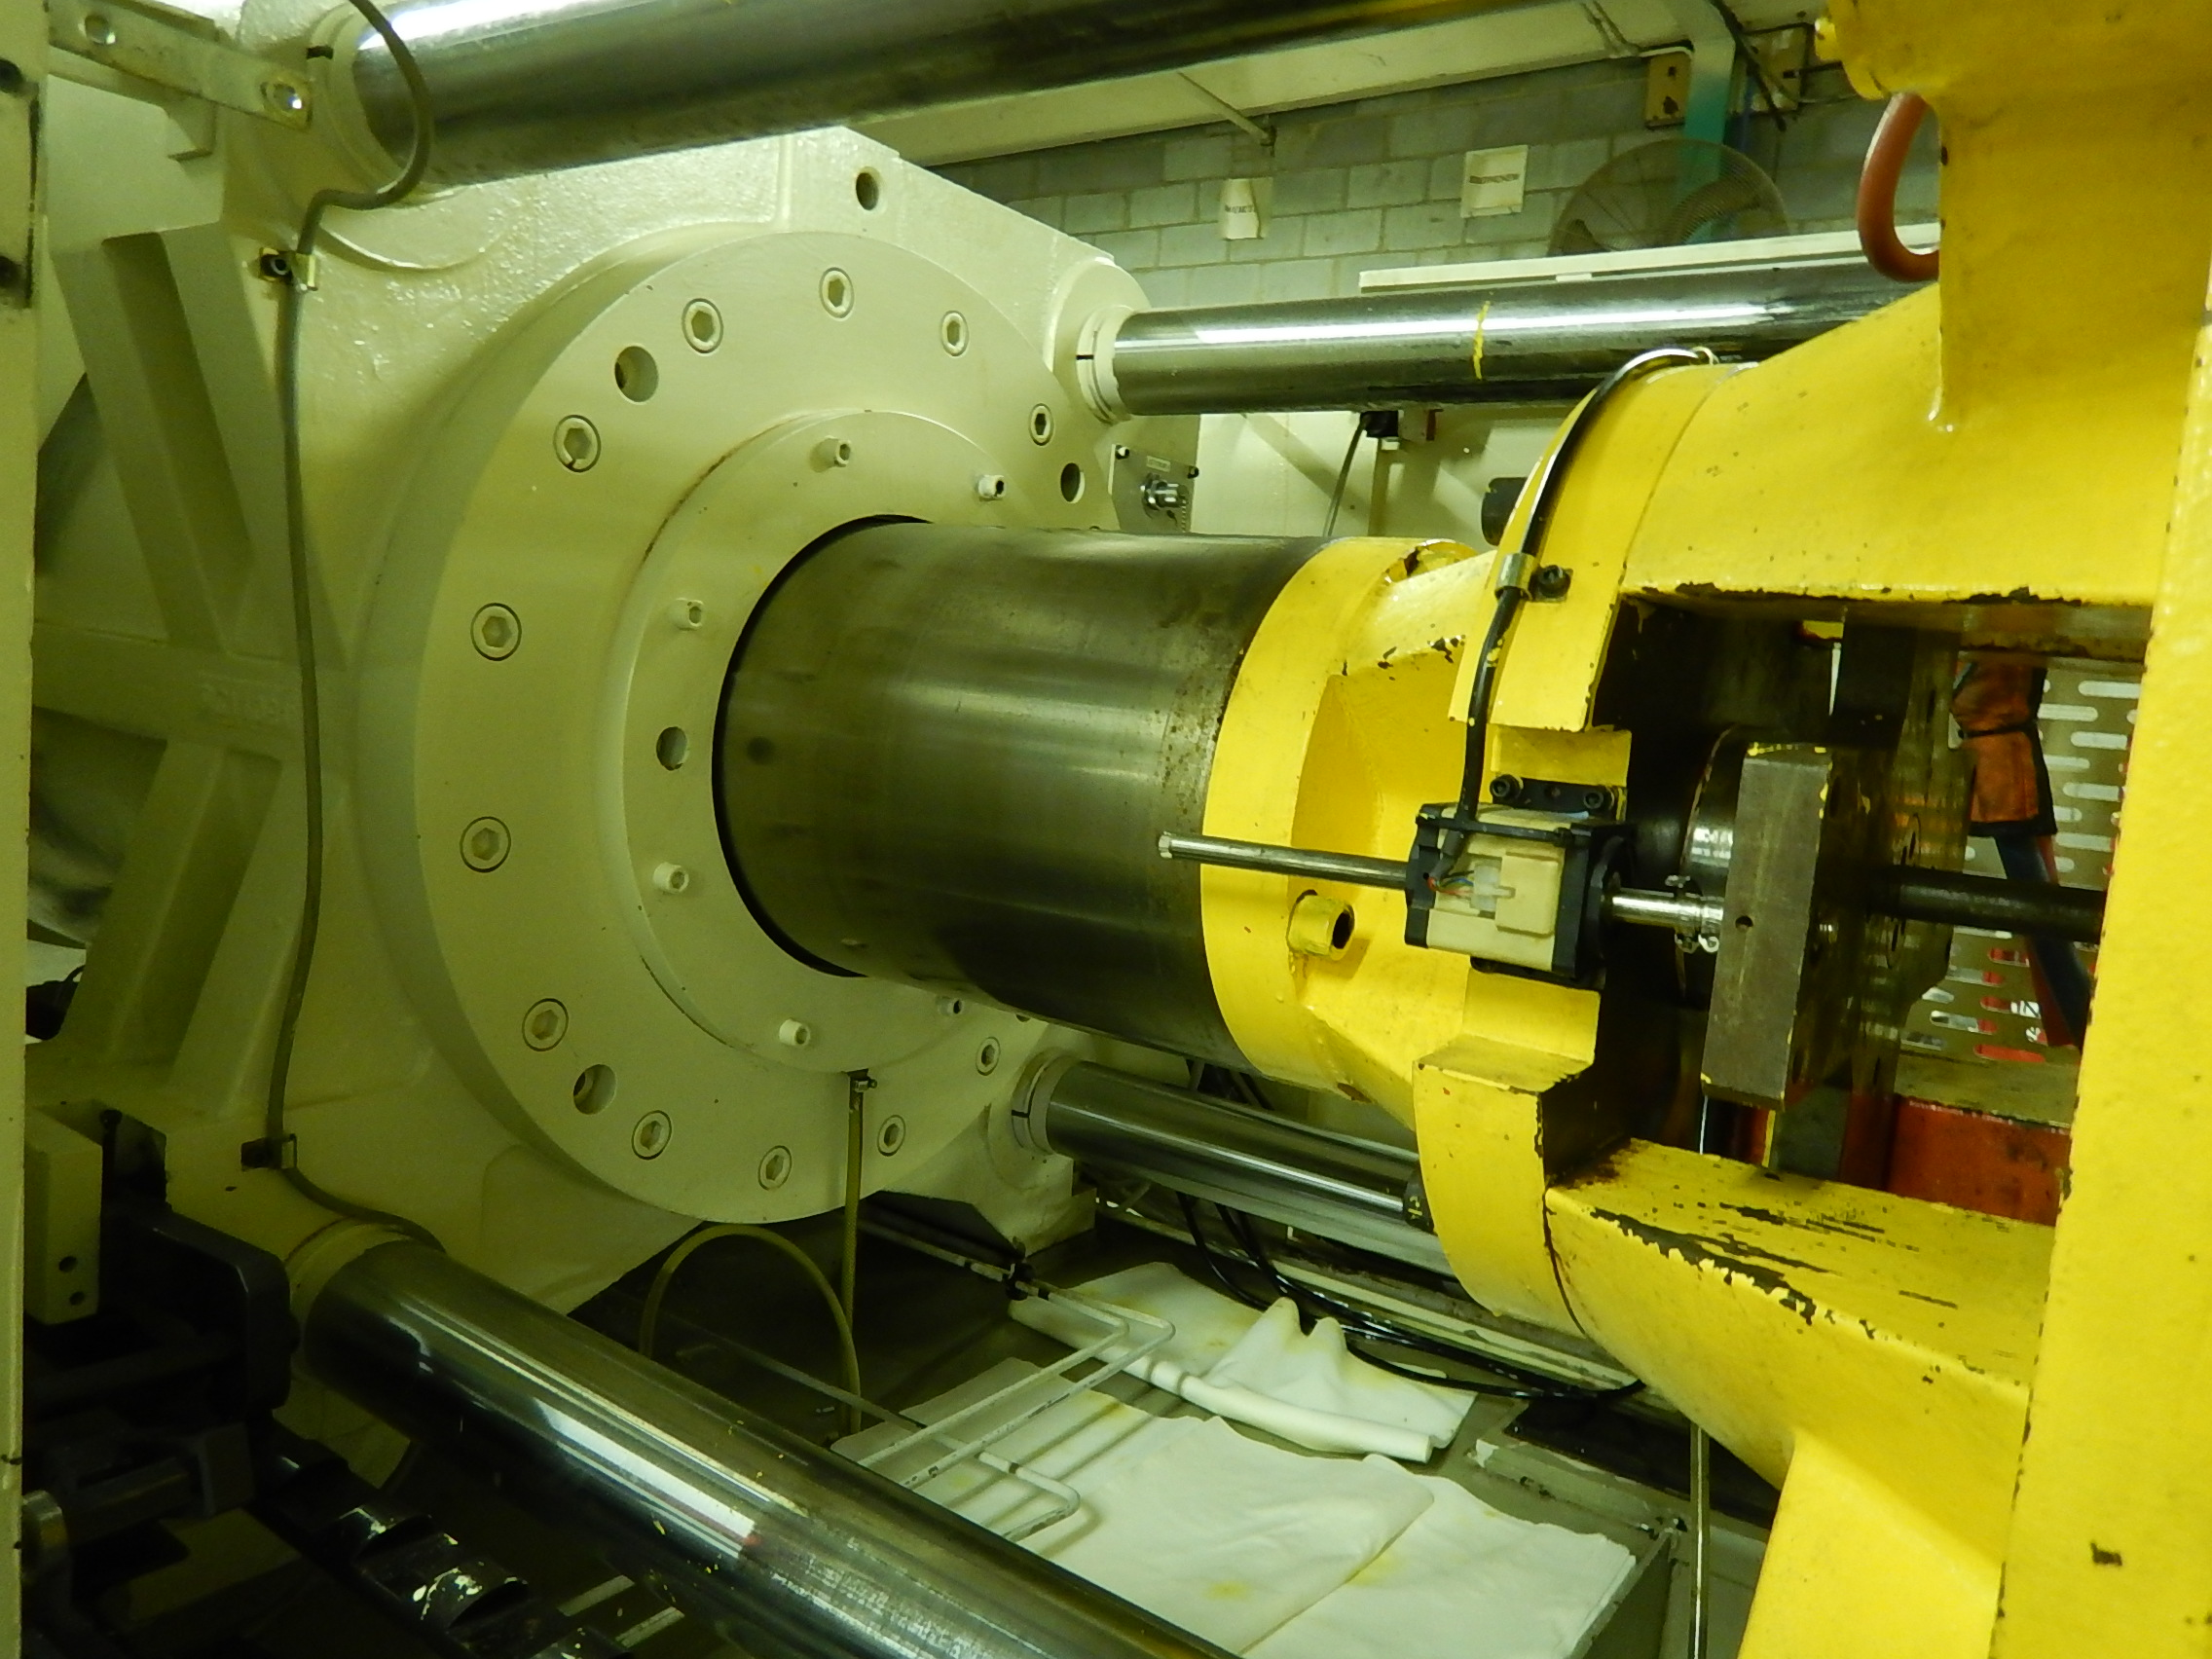 Shinwa-Sekei DM190 Used Injection Molding Machine, 190 ton, Yr. 1999, 10.1 oz.